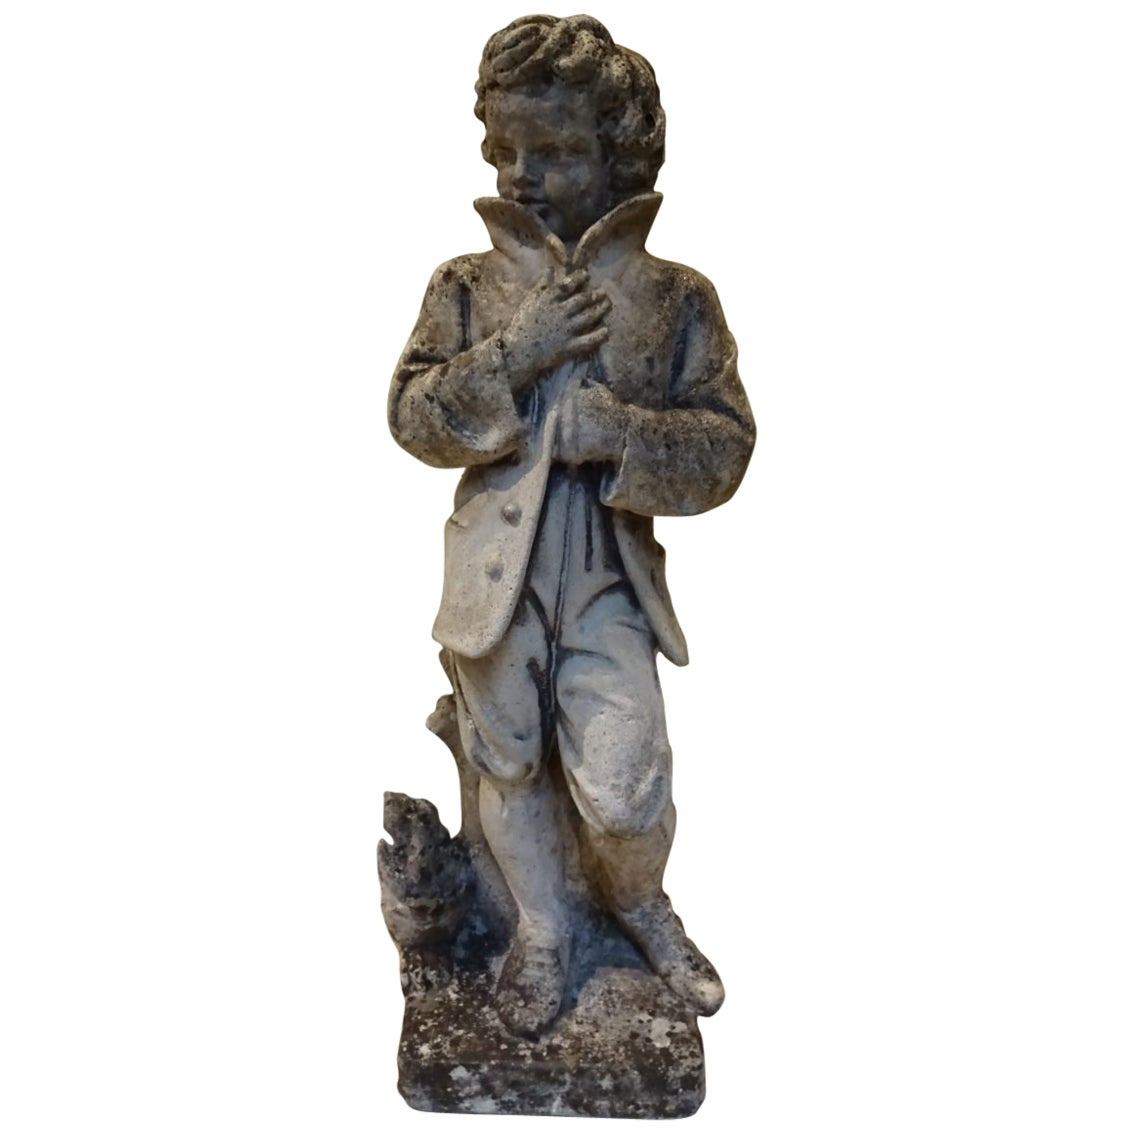 Garden Statue of a Boy